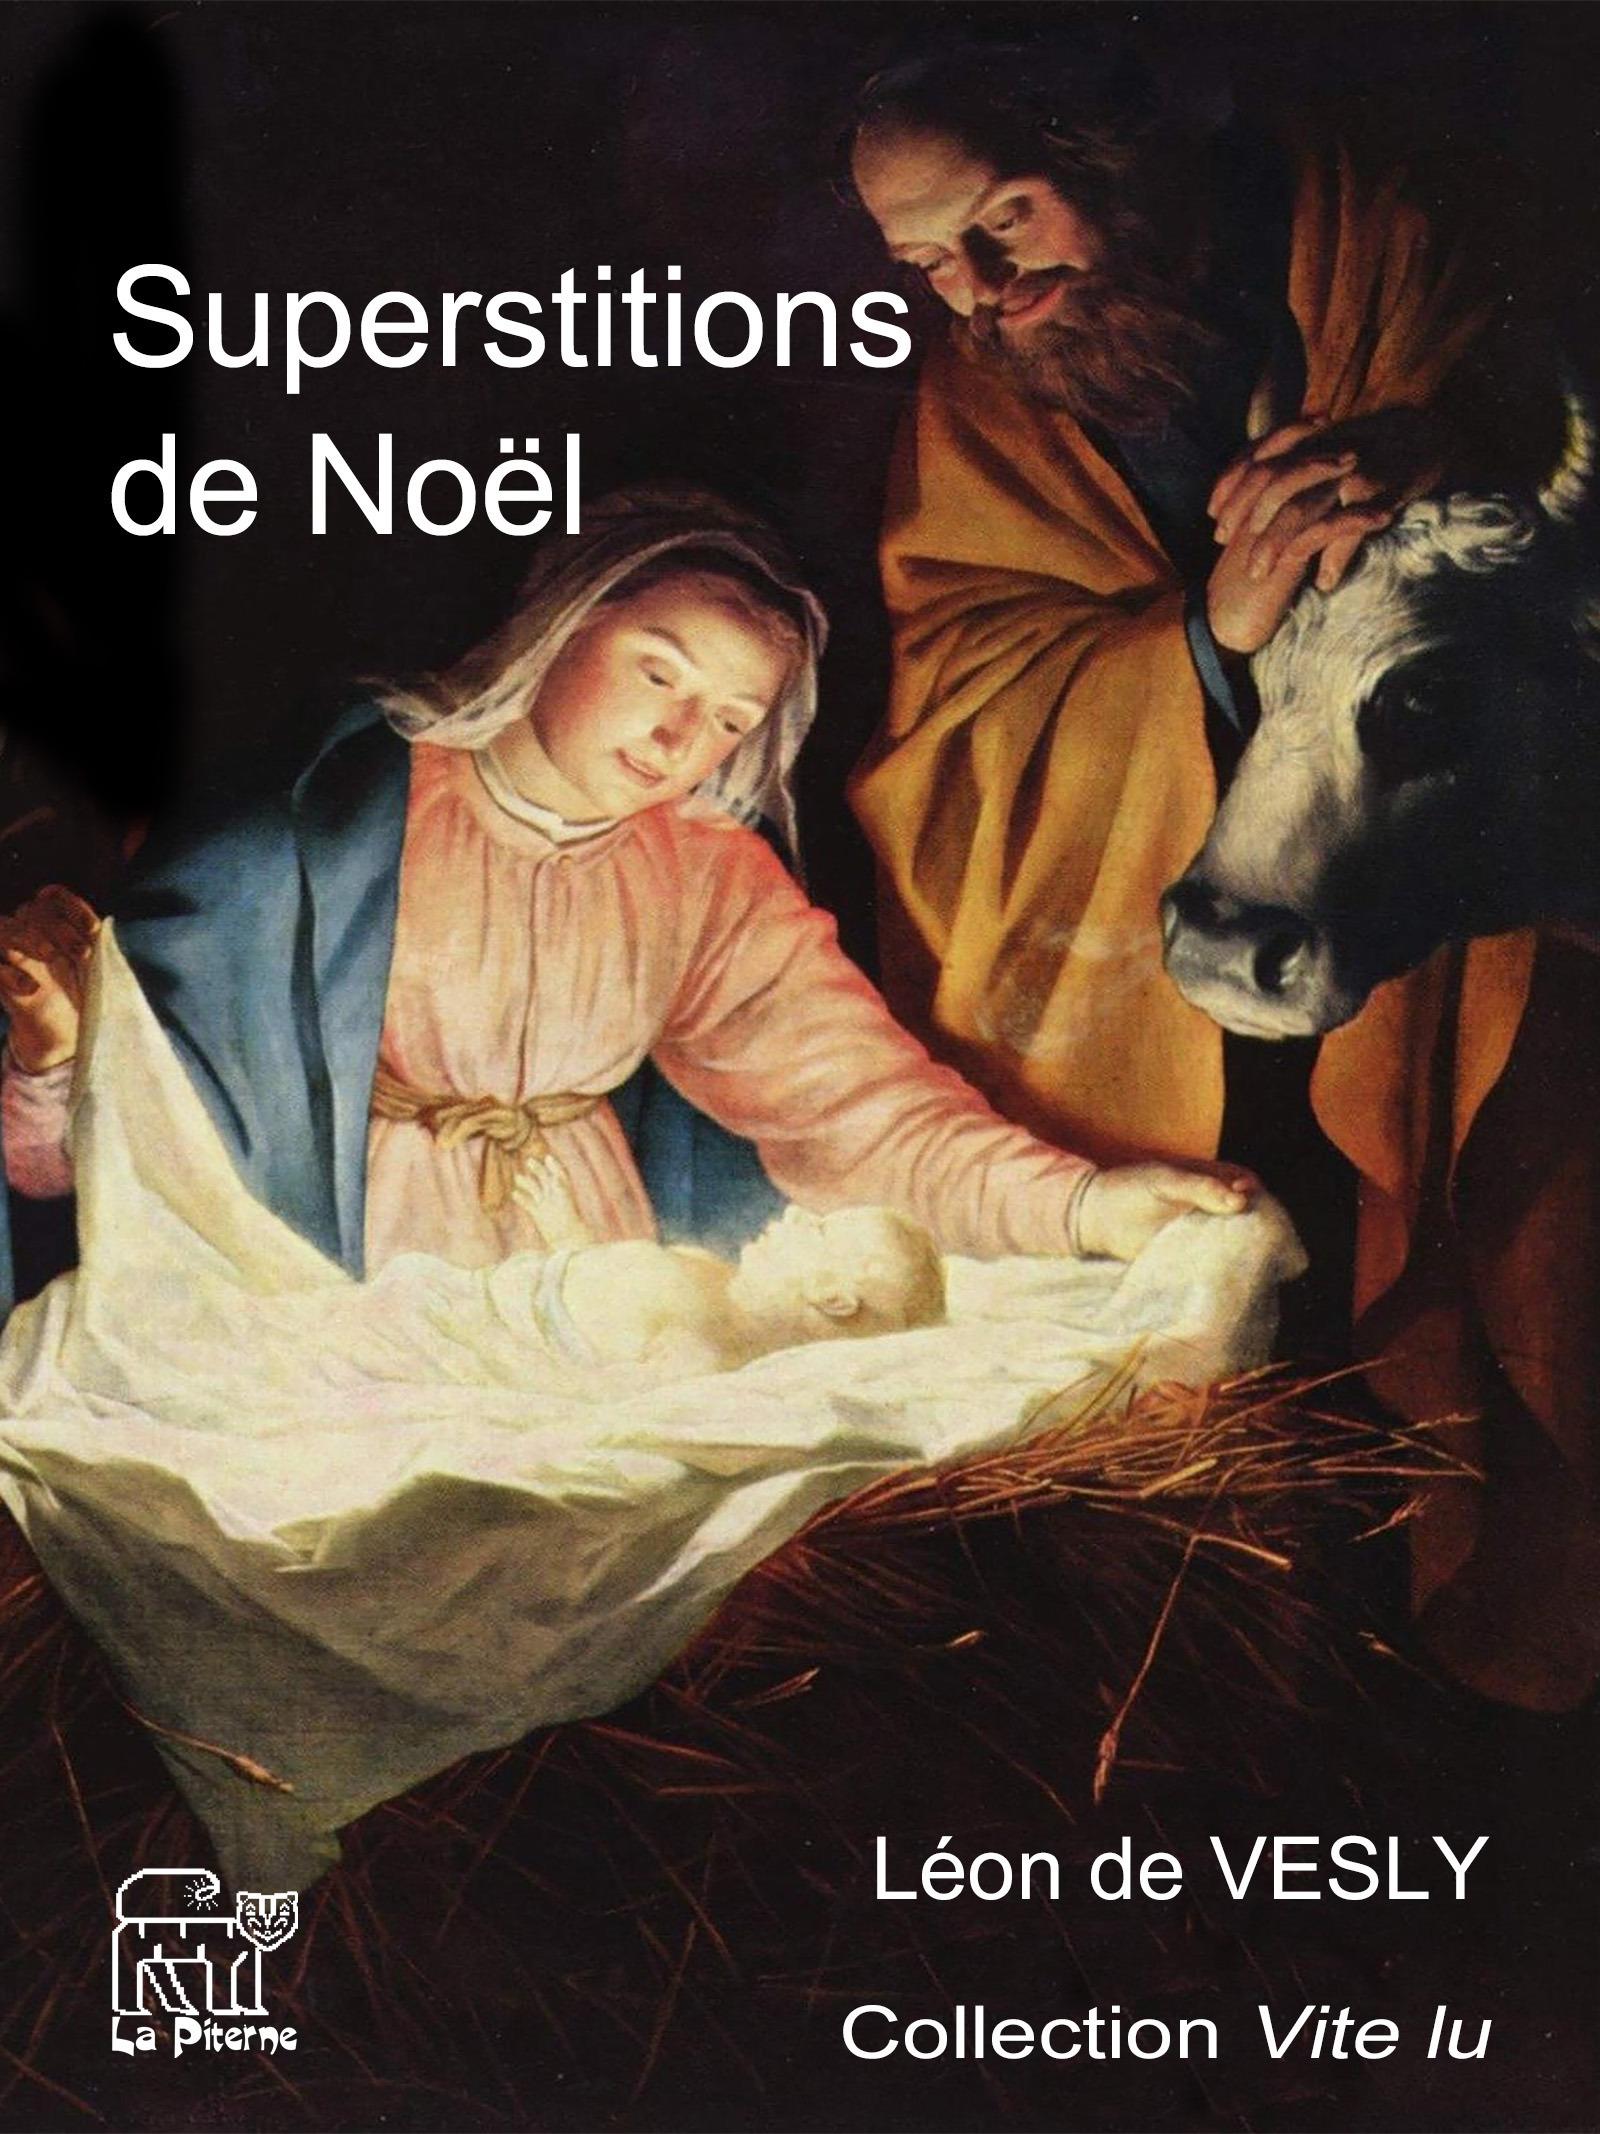 Superstitions de Noël